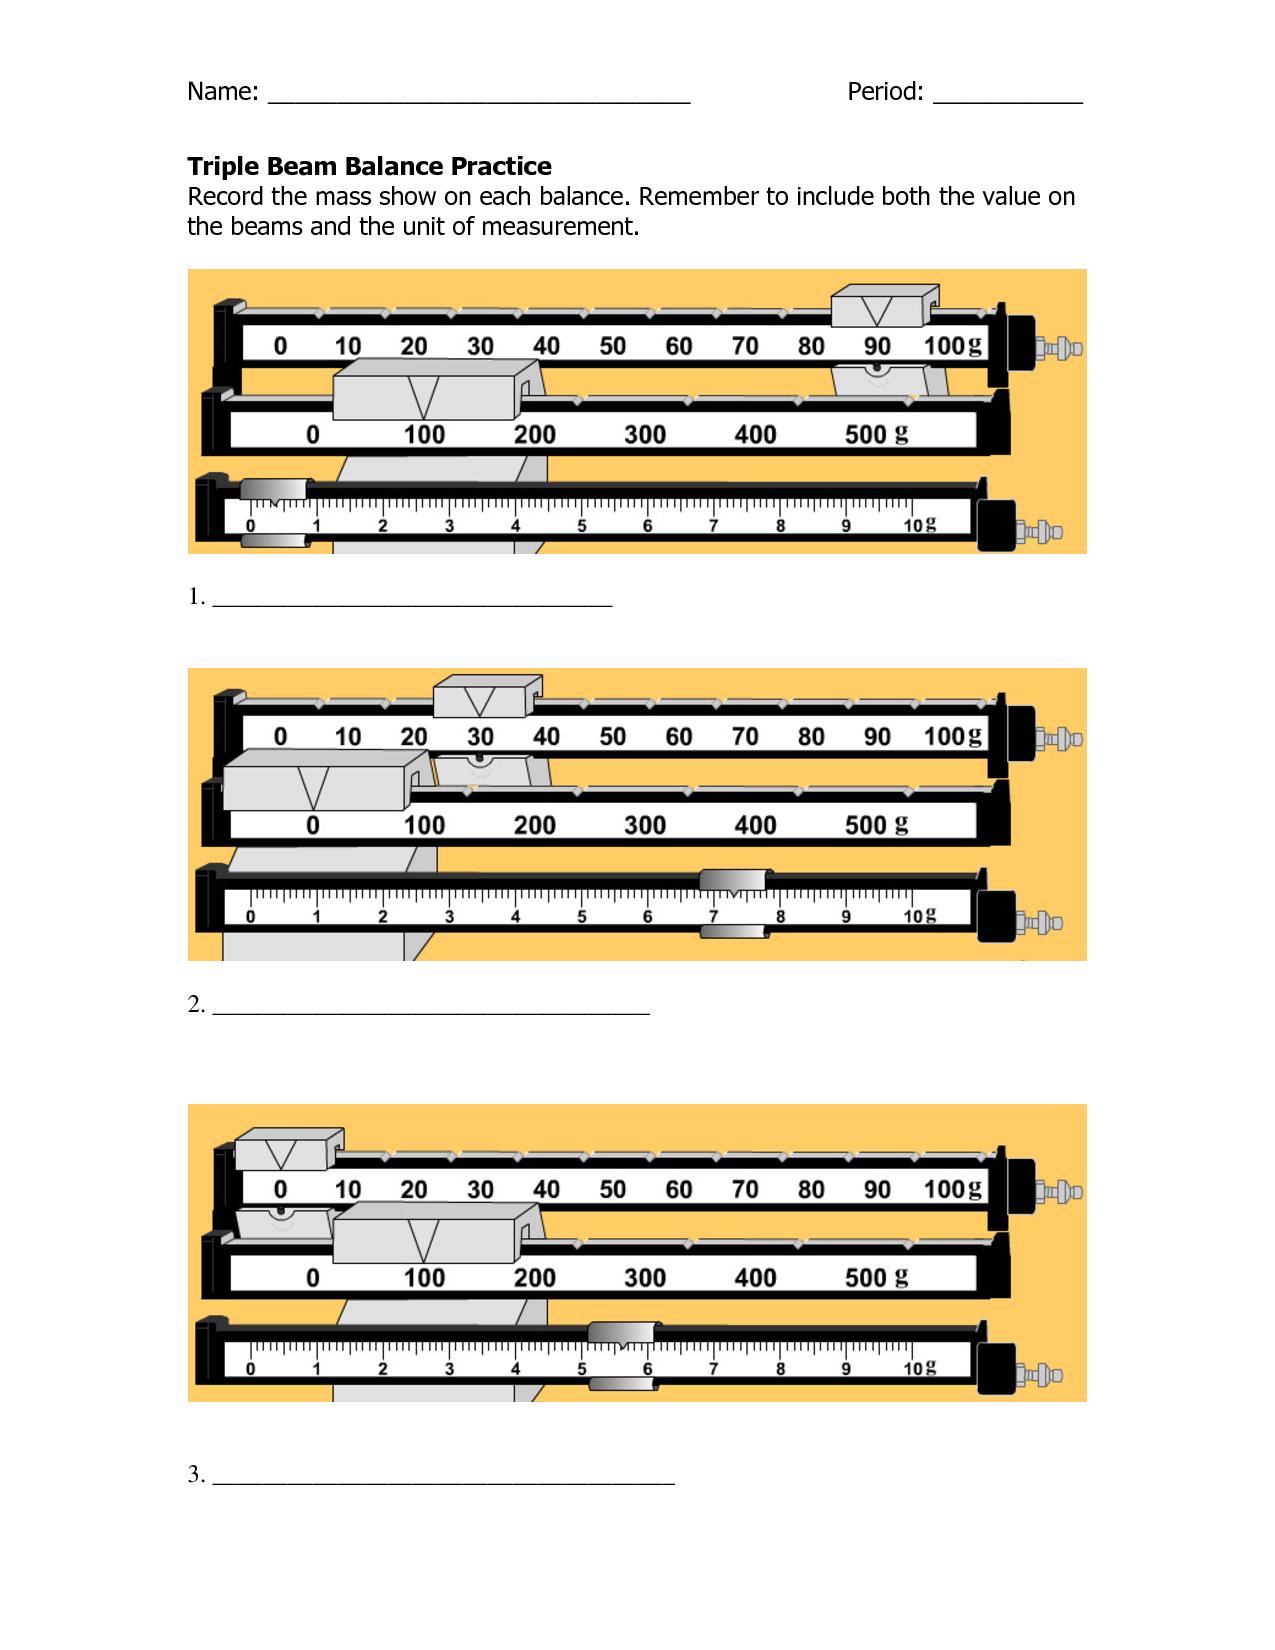 Triple Beam Balance Worksheets The Best Worksheets Image